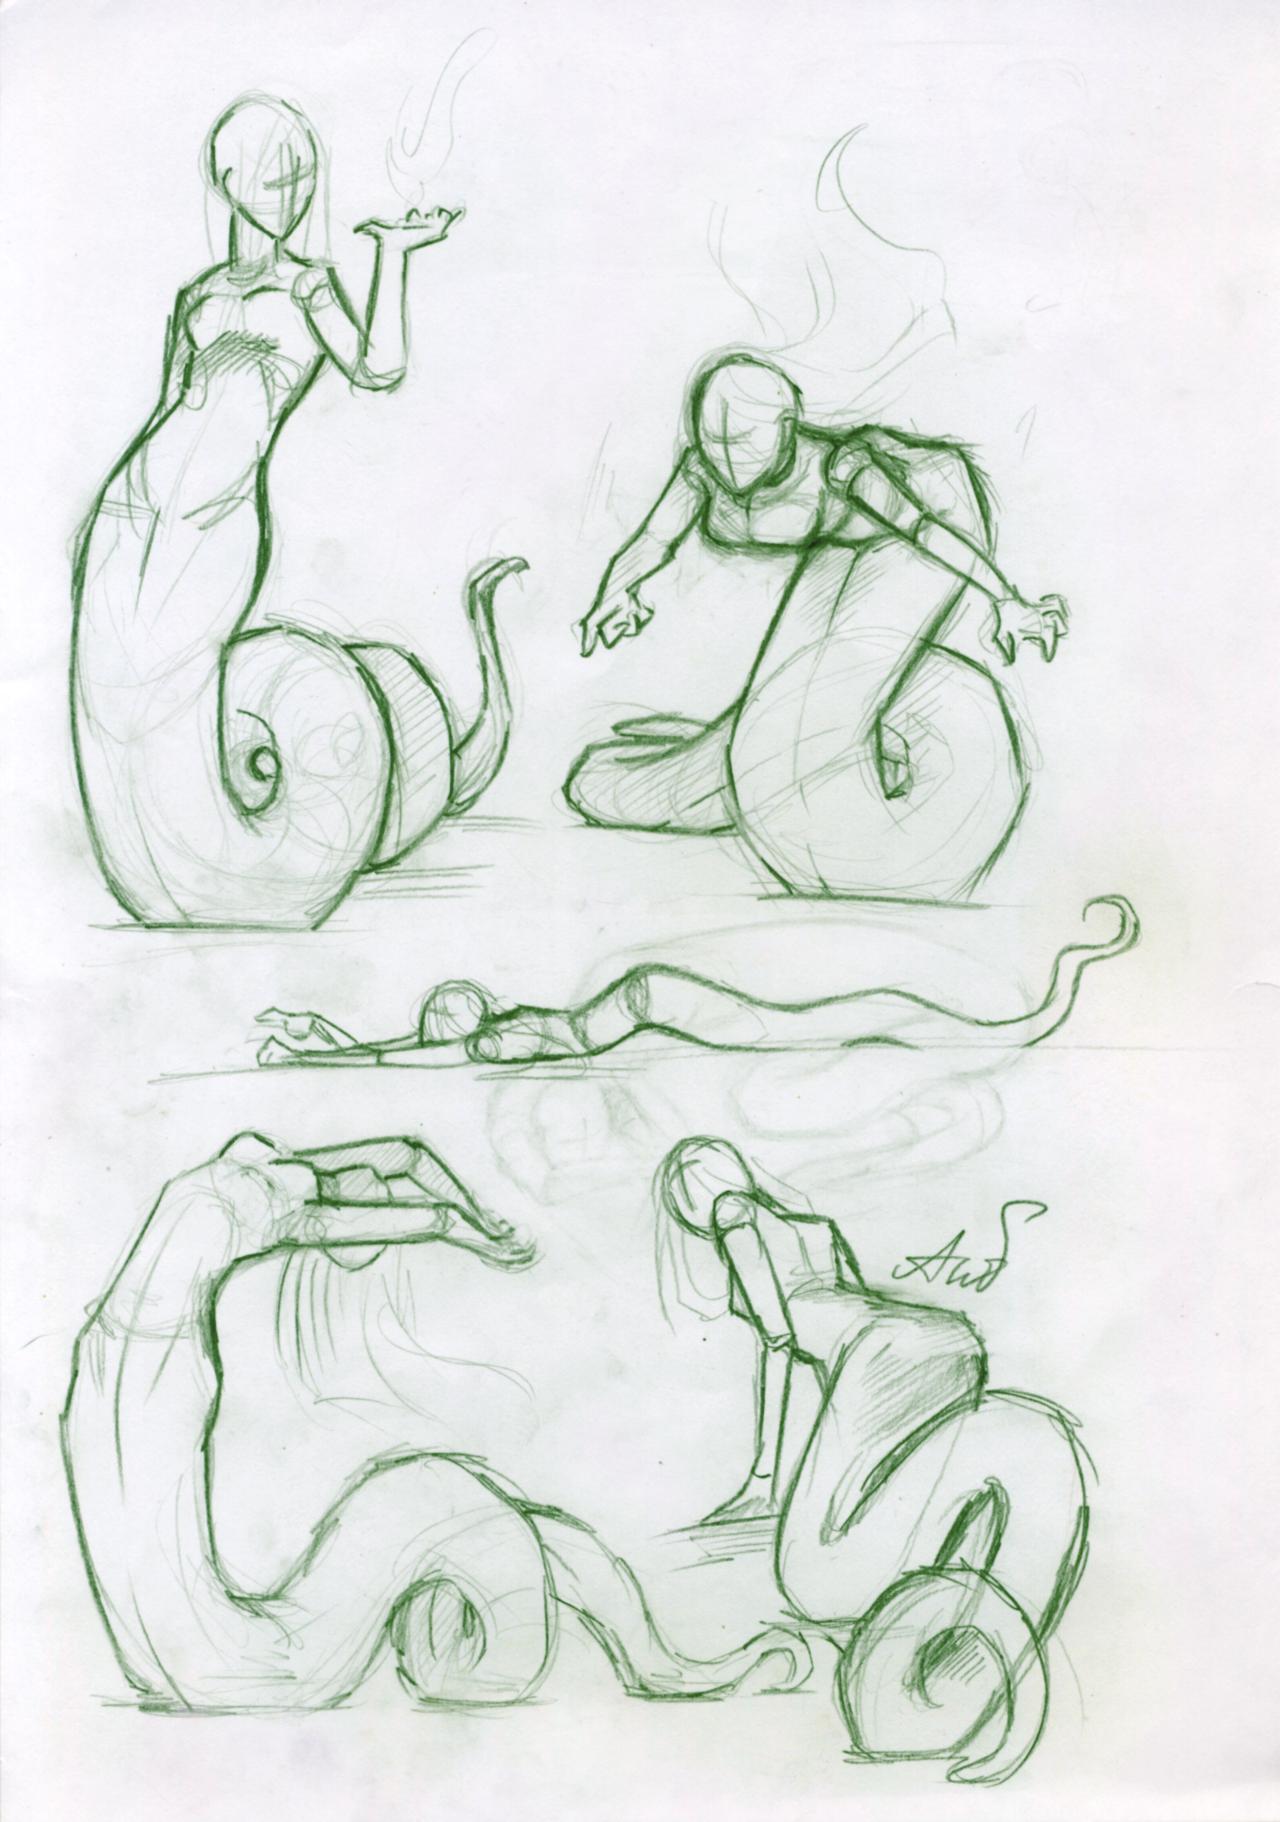 Sketches_nagas by AshiPhoenix on DeviantArt